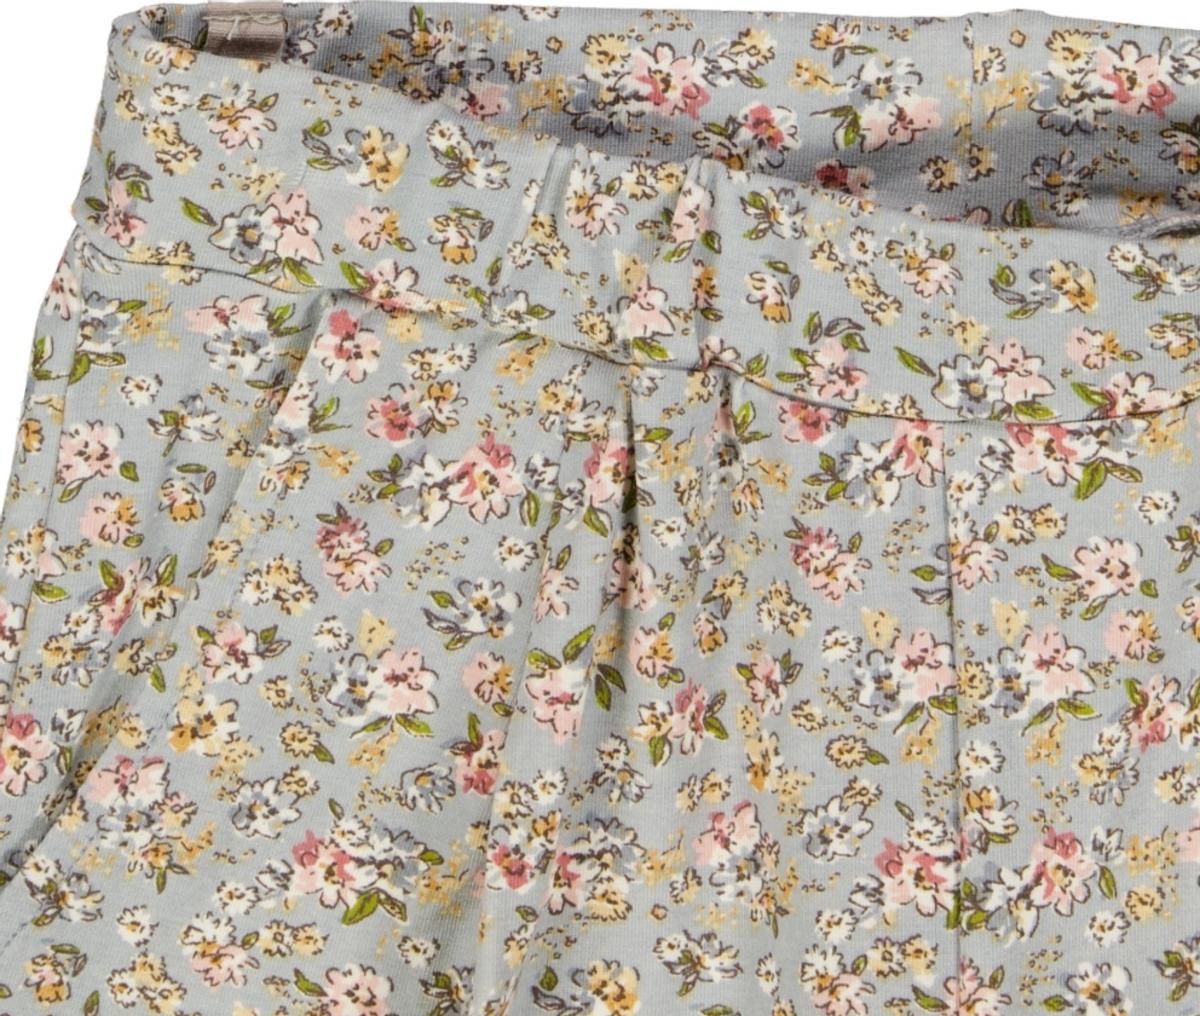 Bukse abbie soft dusty dove flowers